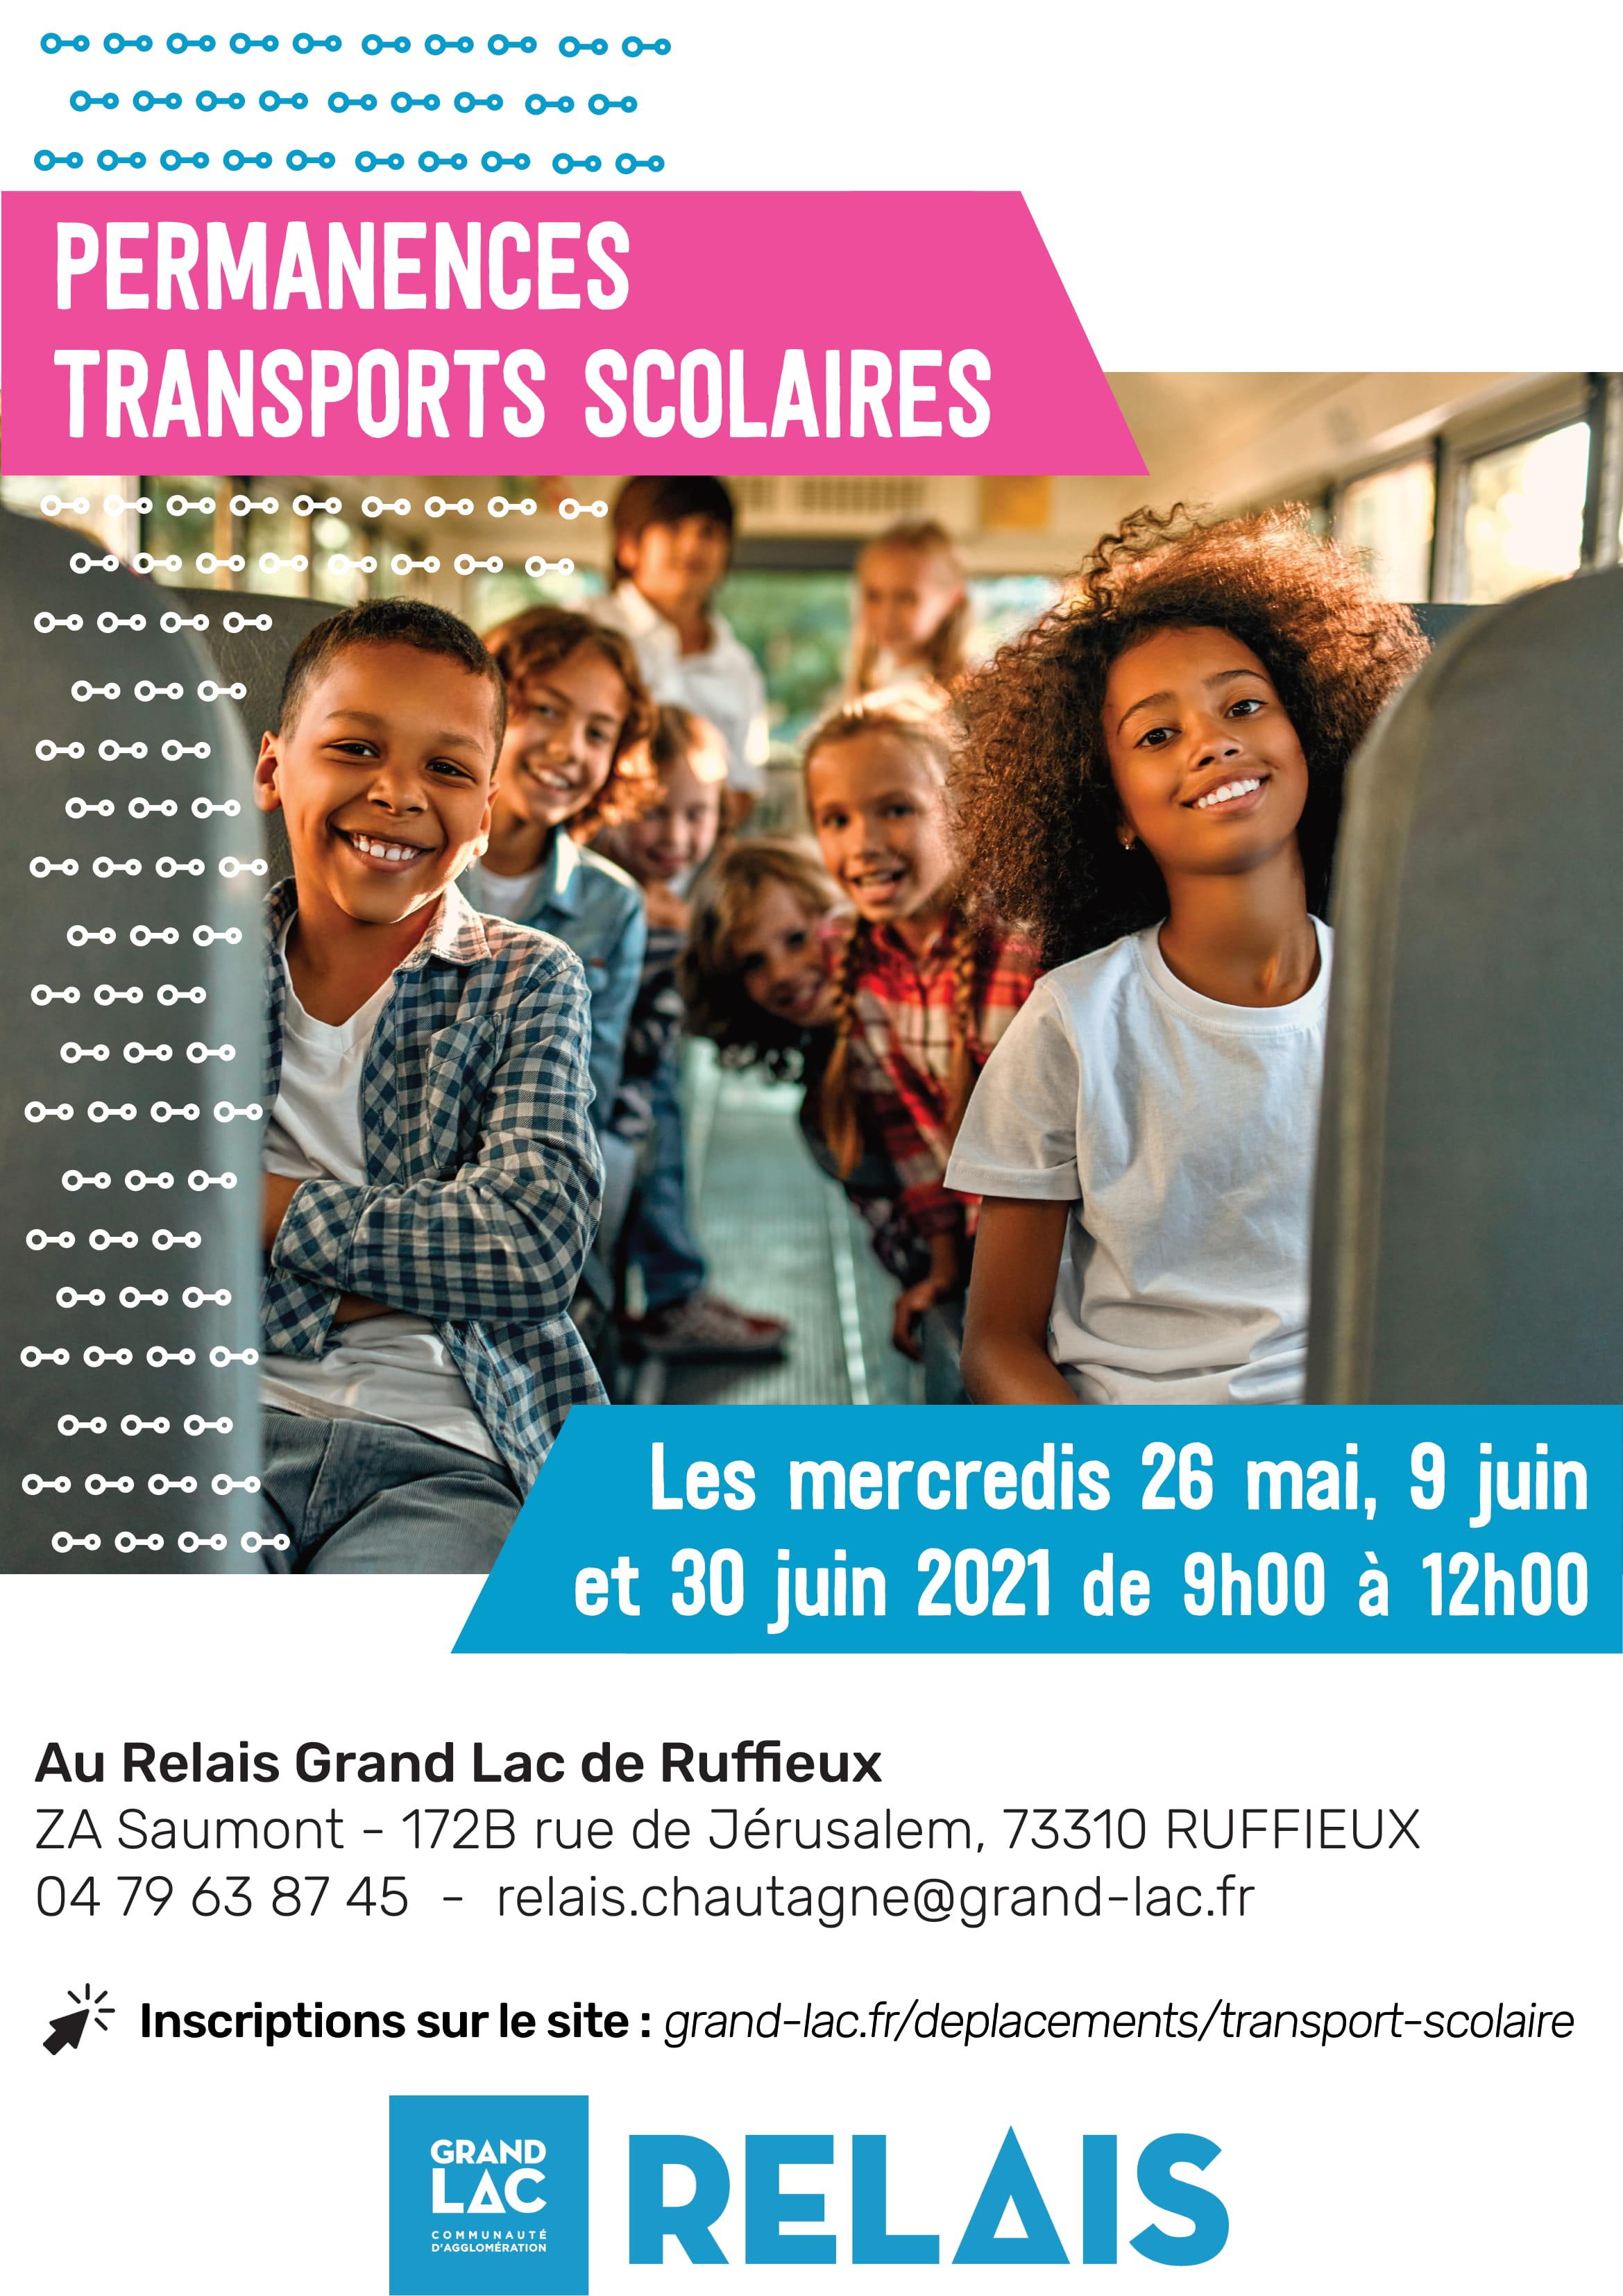 Affiche - Transport scolaire Ruffieux.jpg